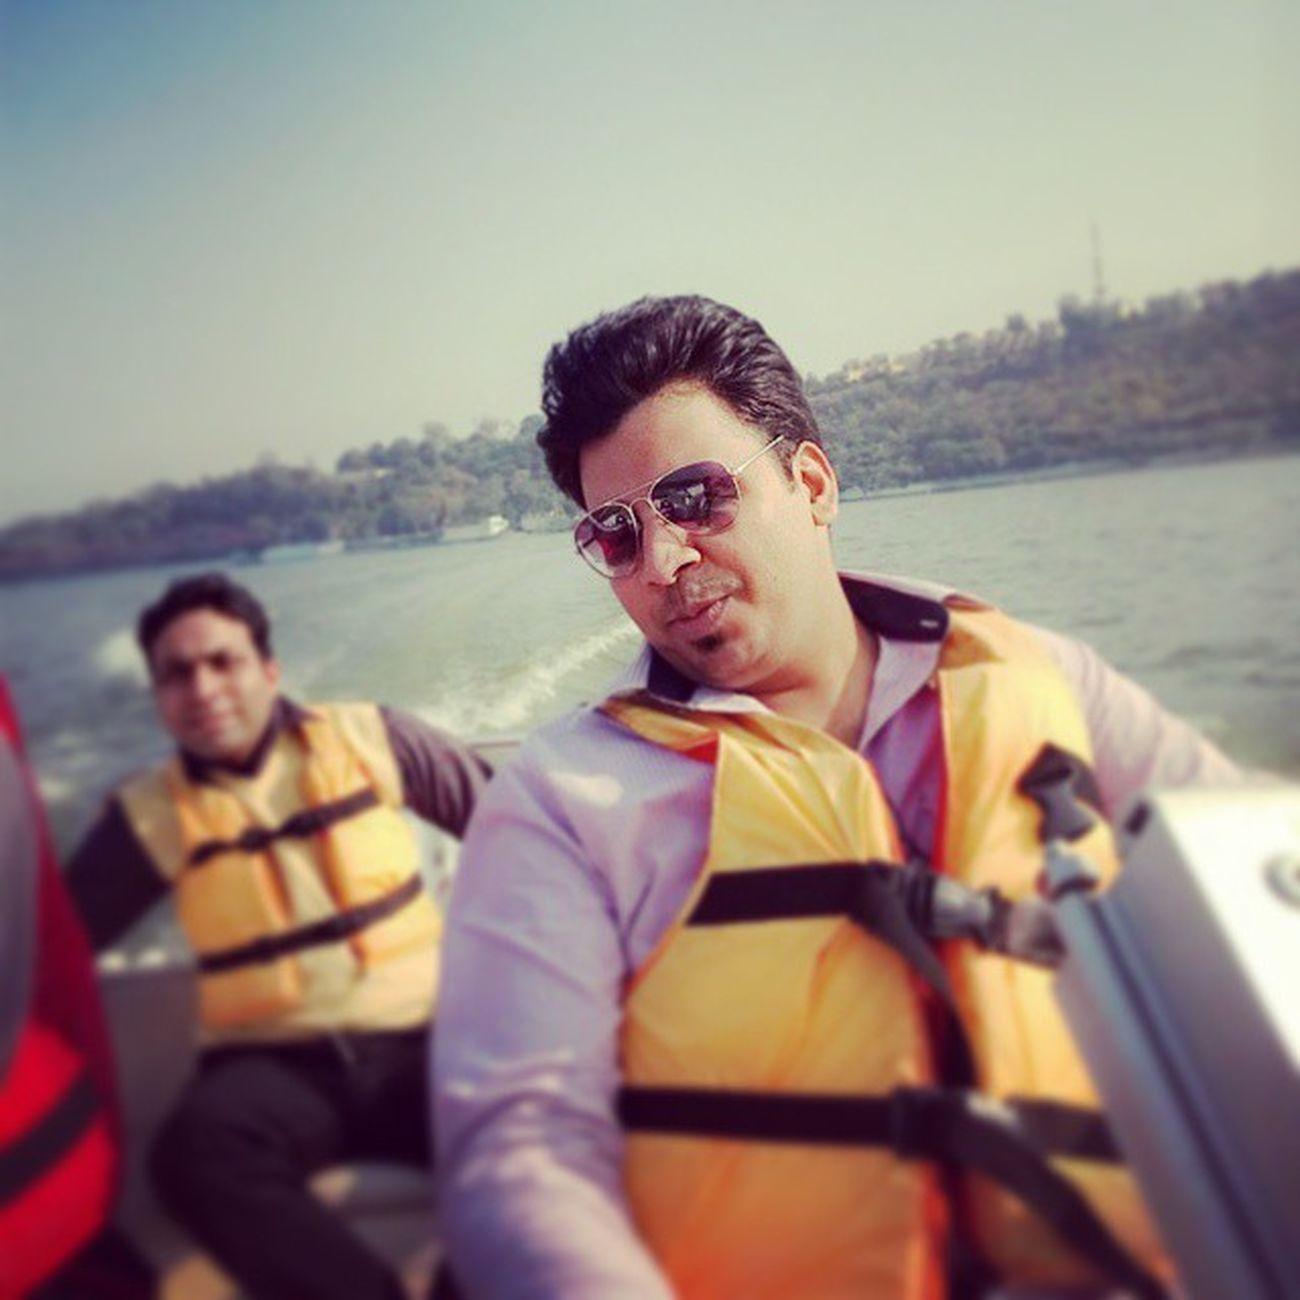 Cityoflakes Motorboating Holidaysfun